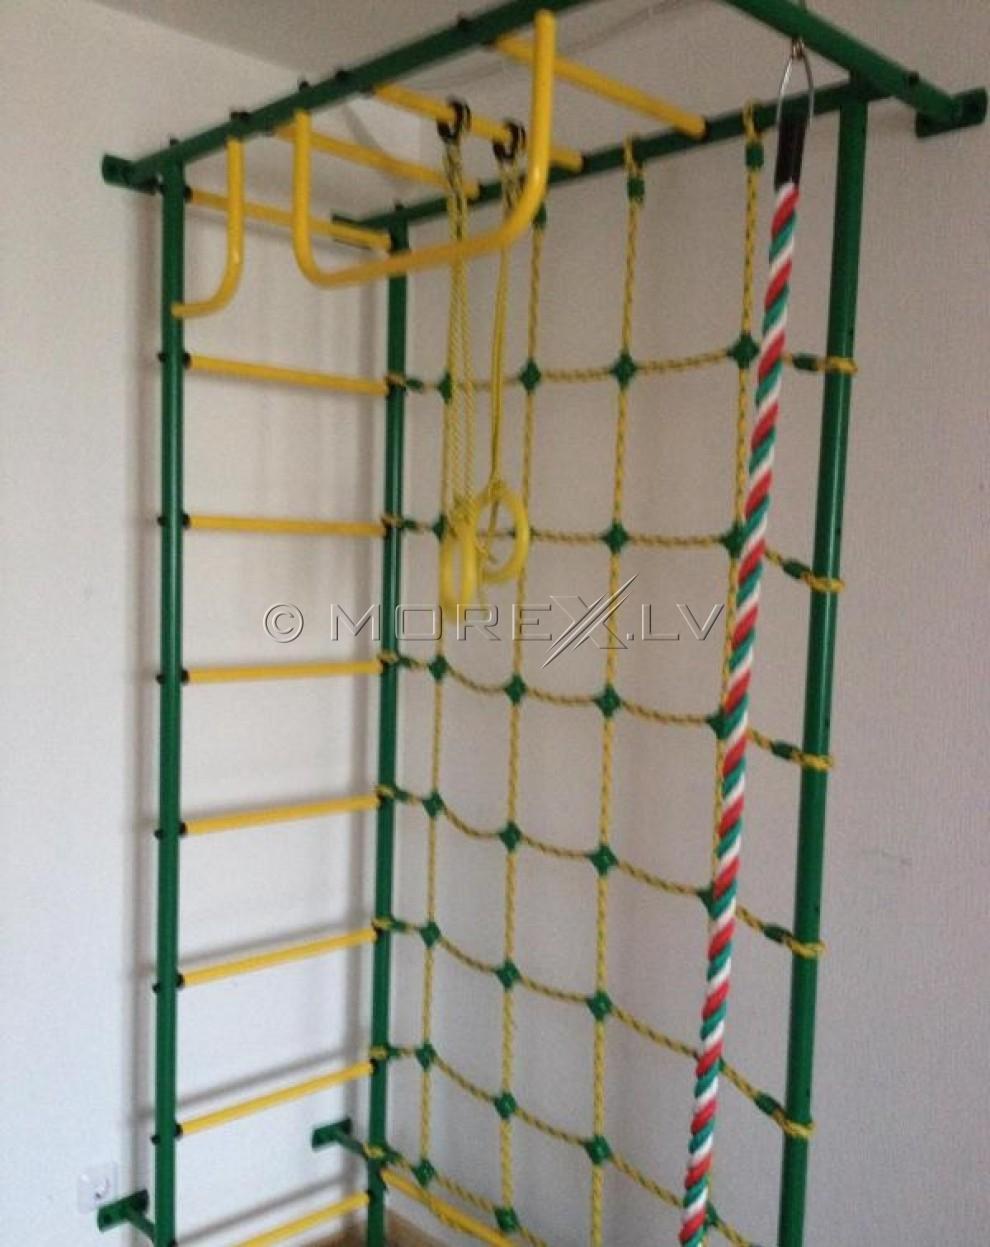 Bērnu sporta komplekss Pioner-8 zaļi-dzeltens (zviedru siena)